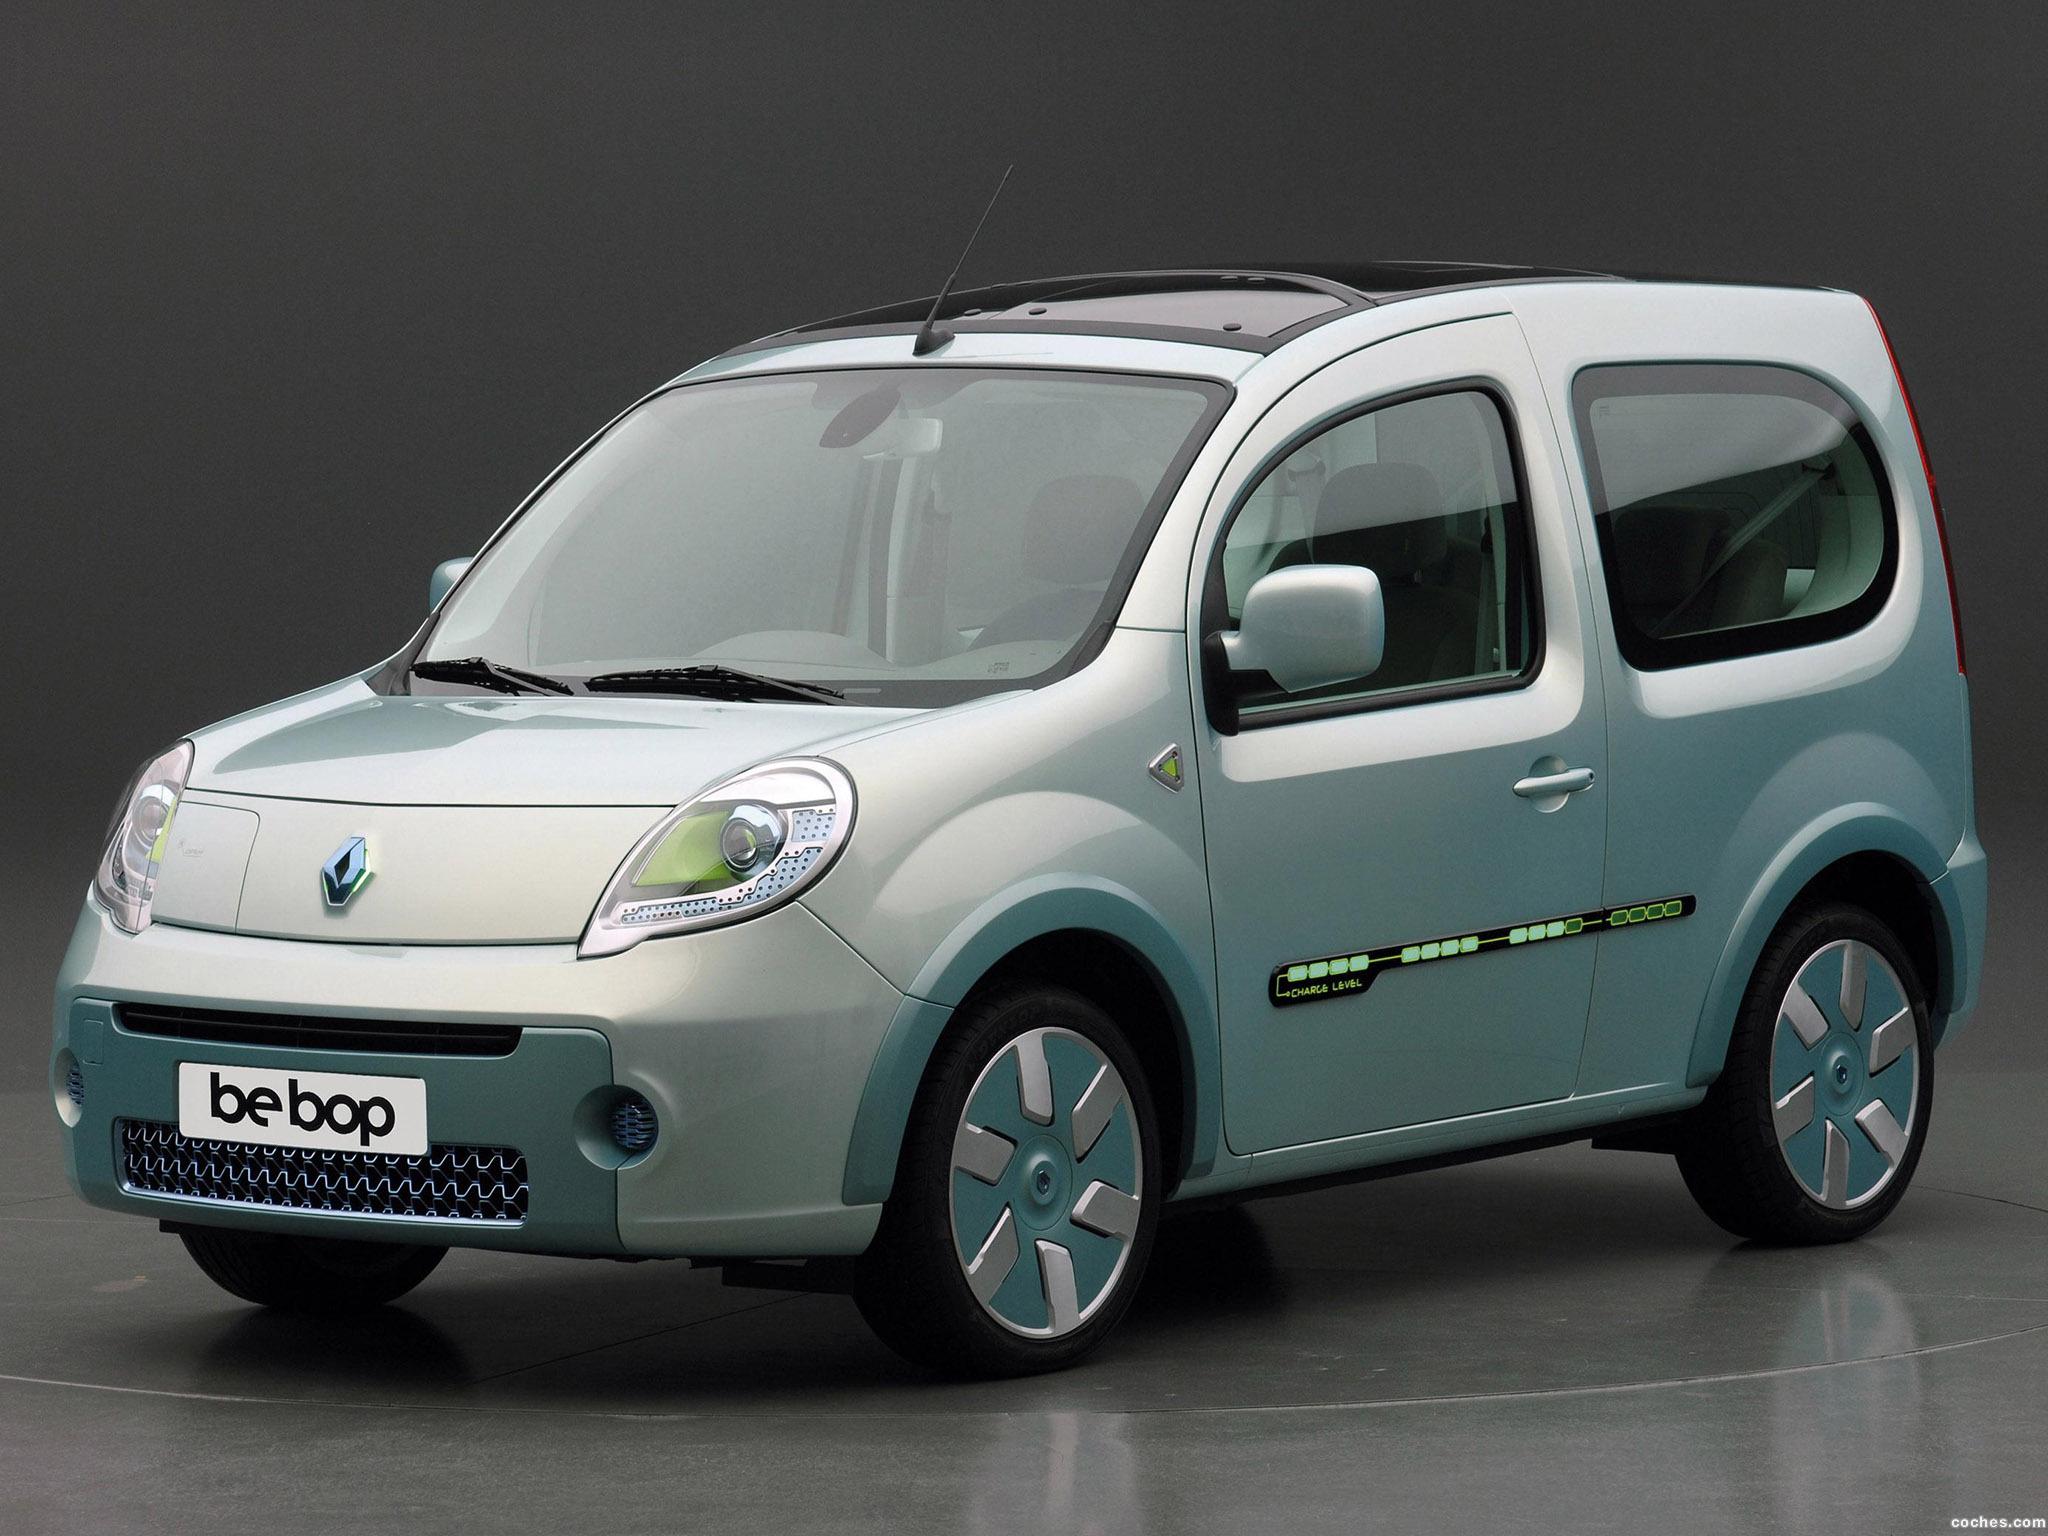 Foto 0 de Renault Kangoo Be Bop Z.E. Concept 2009